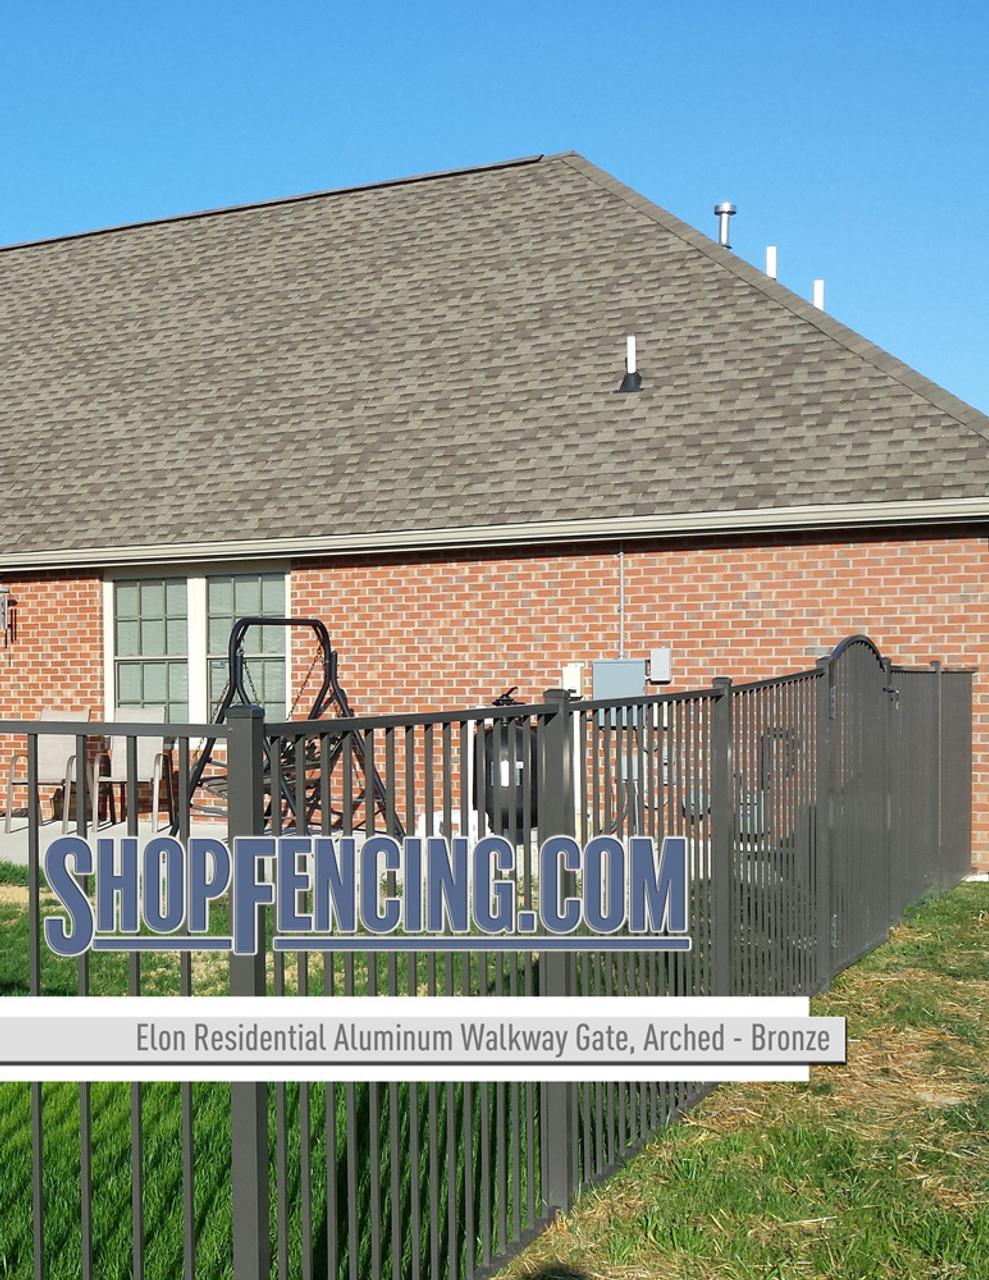 Bronze Residential Elon Aluminum Walkway Gate From ShopFencing.com